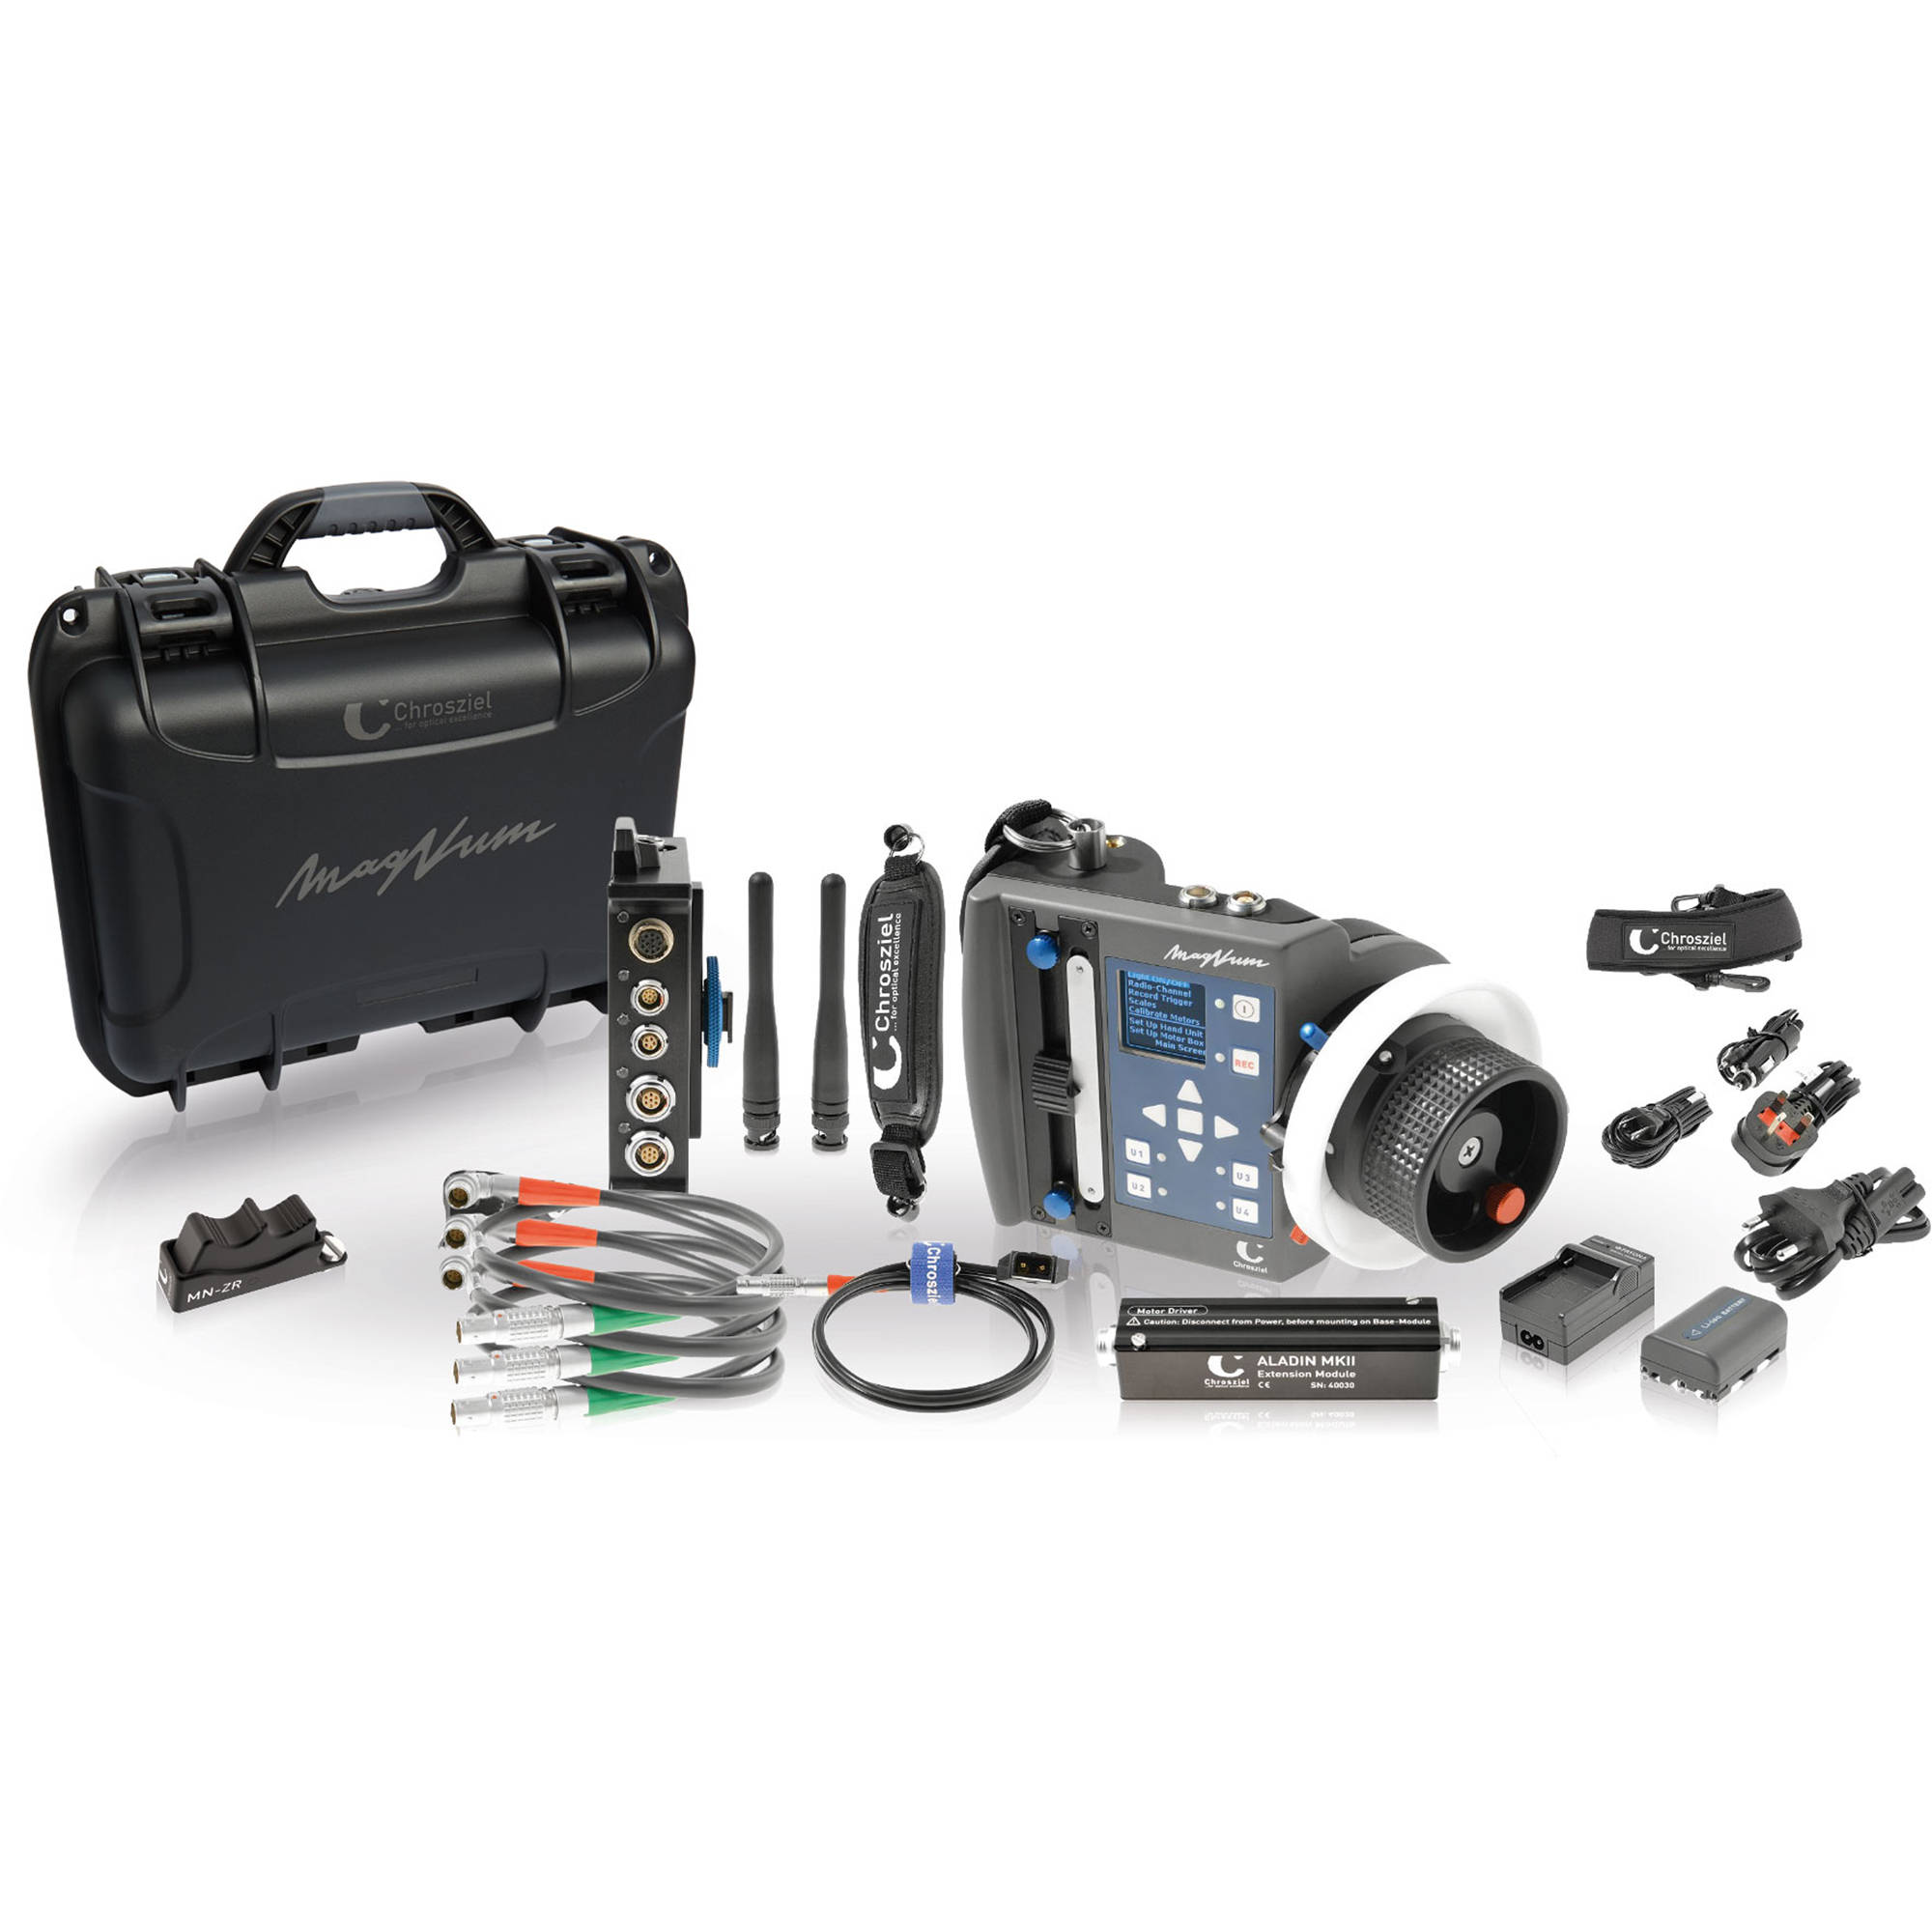 Preston standard lens motor cable Lemo 1B 7 pin 60cm